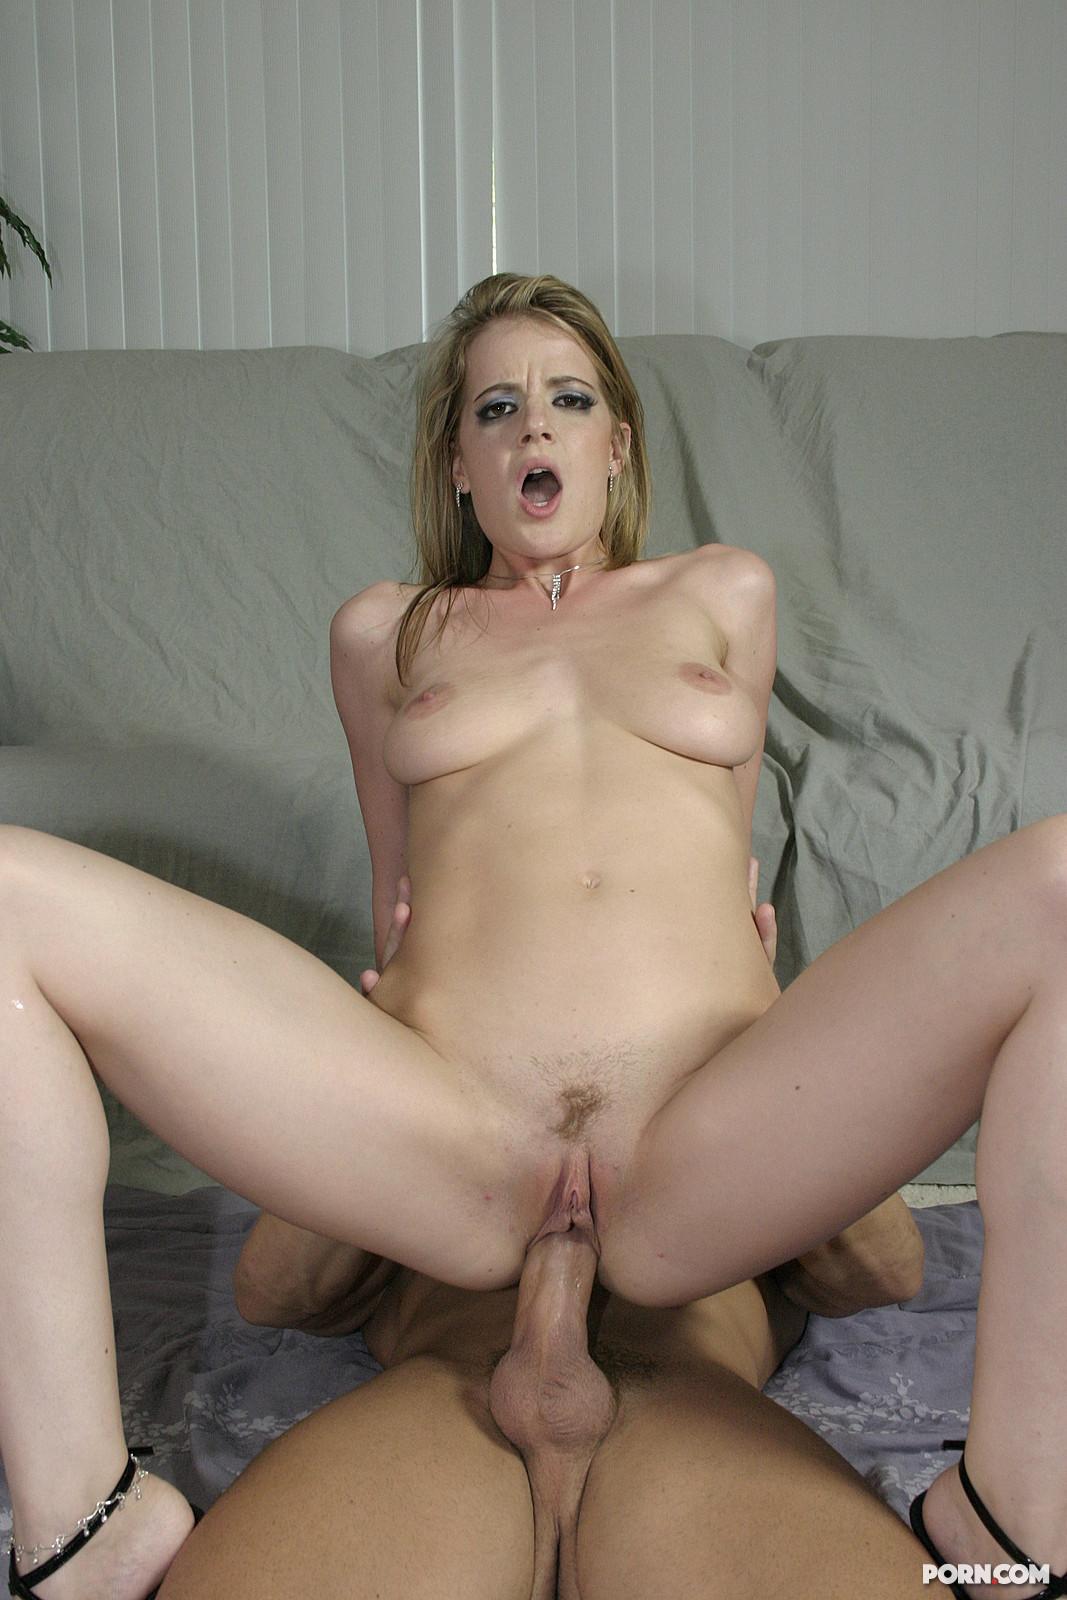 Молодой сантехник трахает зрелую хозяйку на кухне » Порно ...